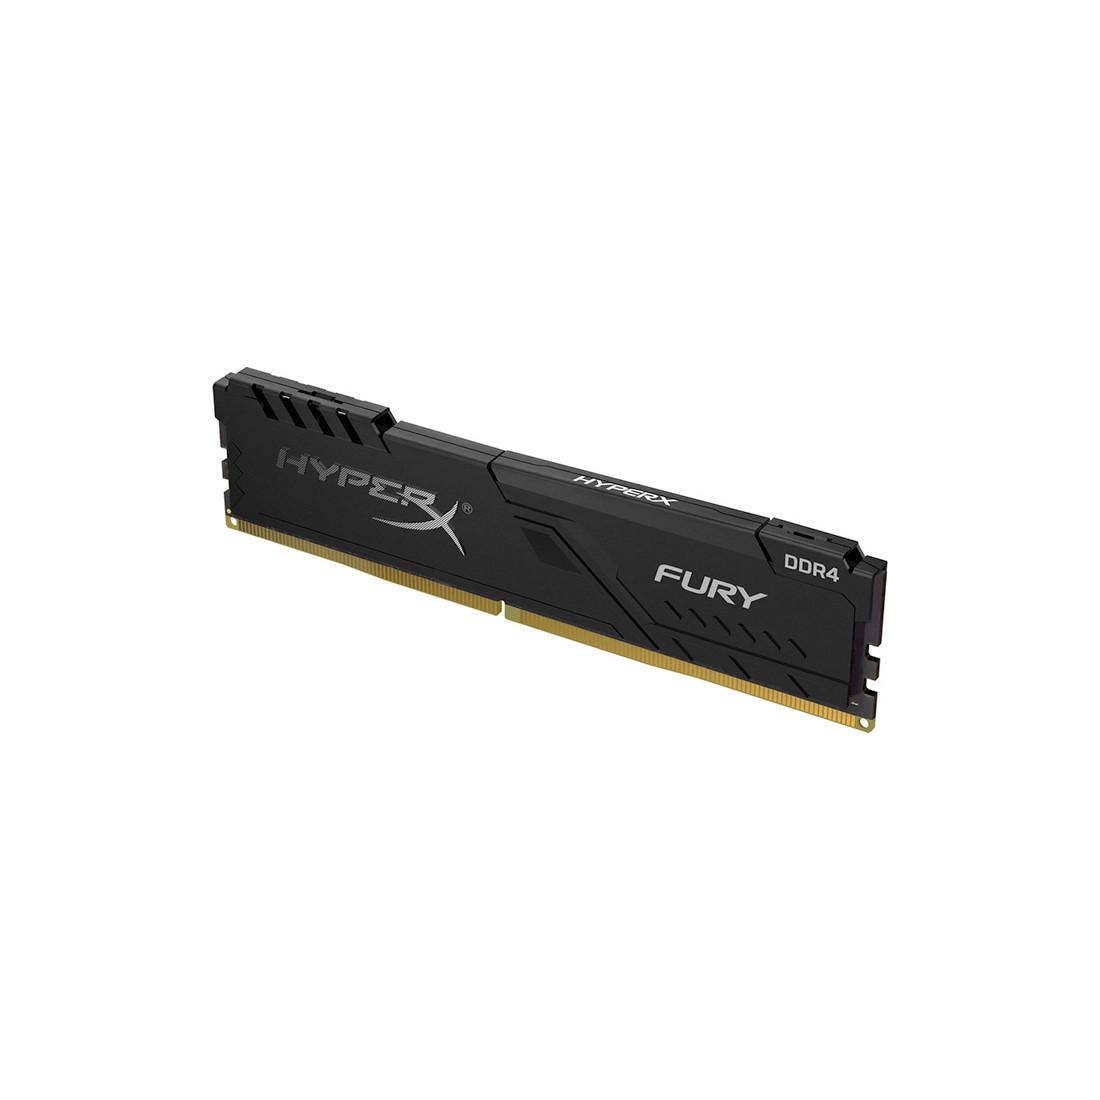 Модуль памяти Kingston HyperX Fury HX430C15FB3/8 (DDR4, 8GB, DIMM)